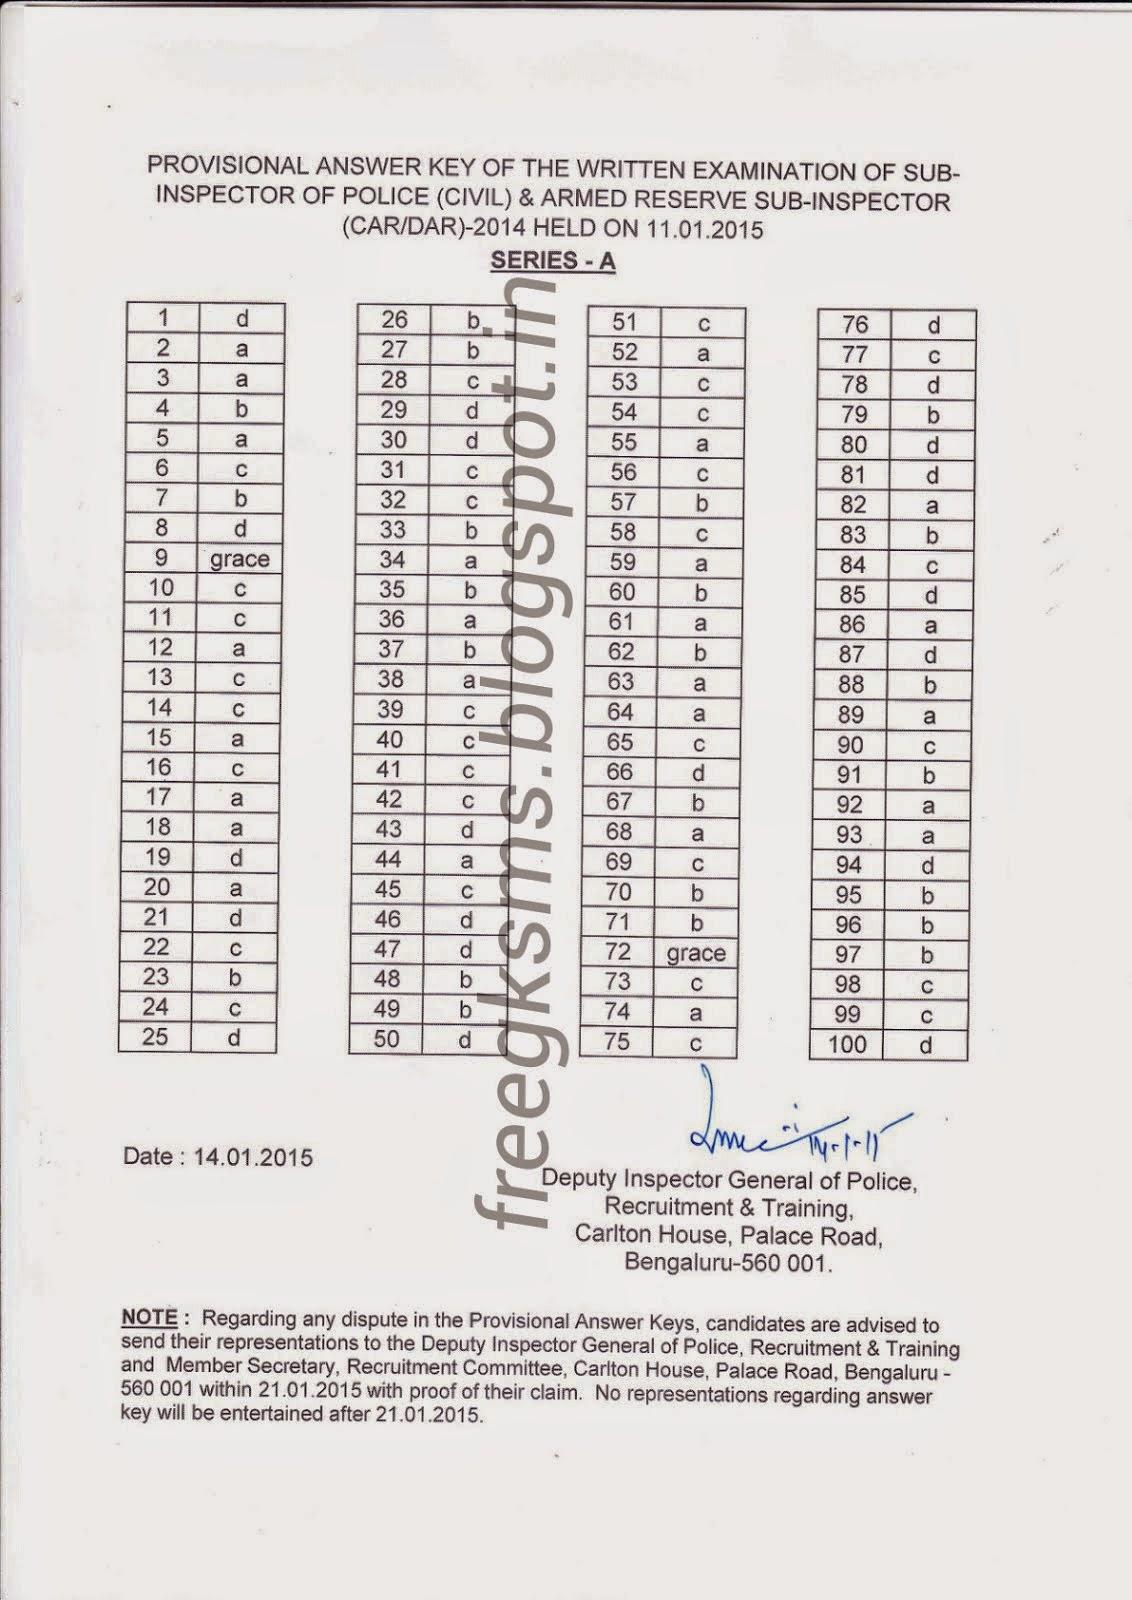 FREEGKSMS(ಸಾಮಾನ್ಯ ಜ್ಞಾನ) : Written Examination Provisional